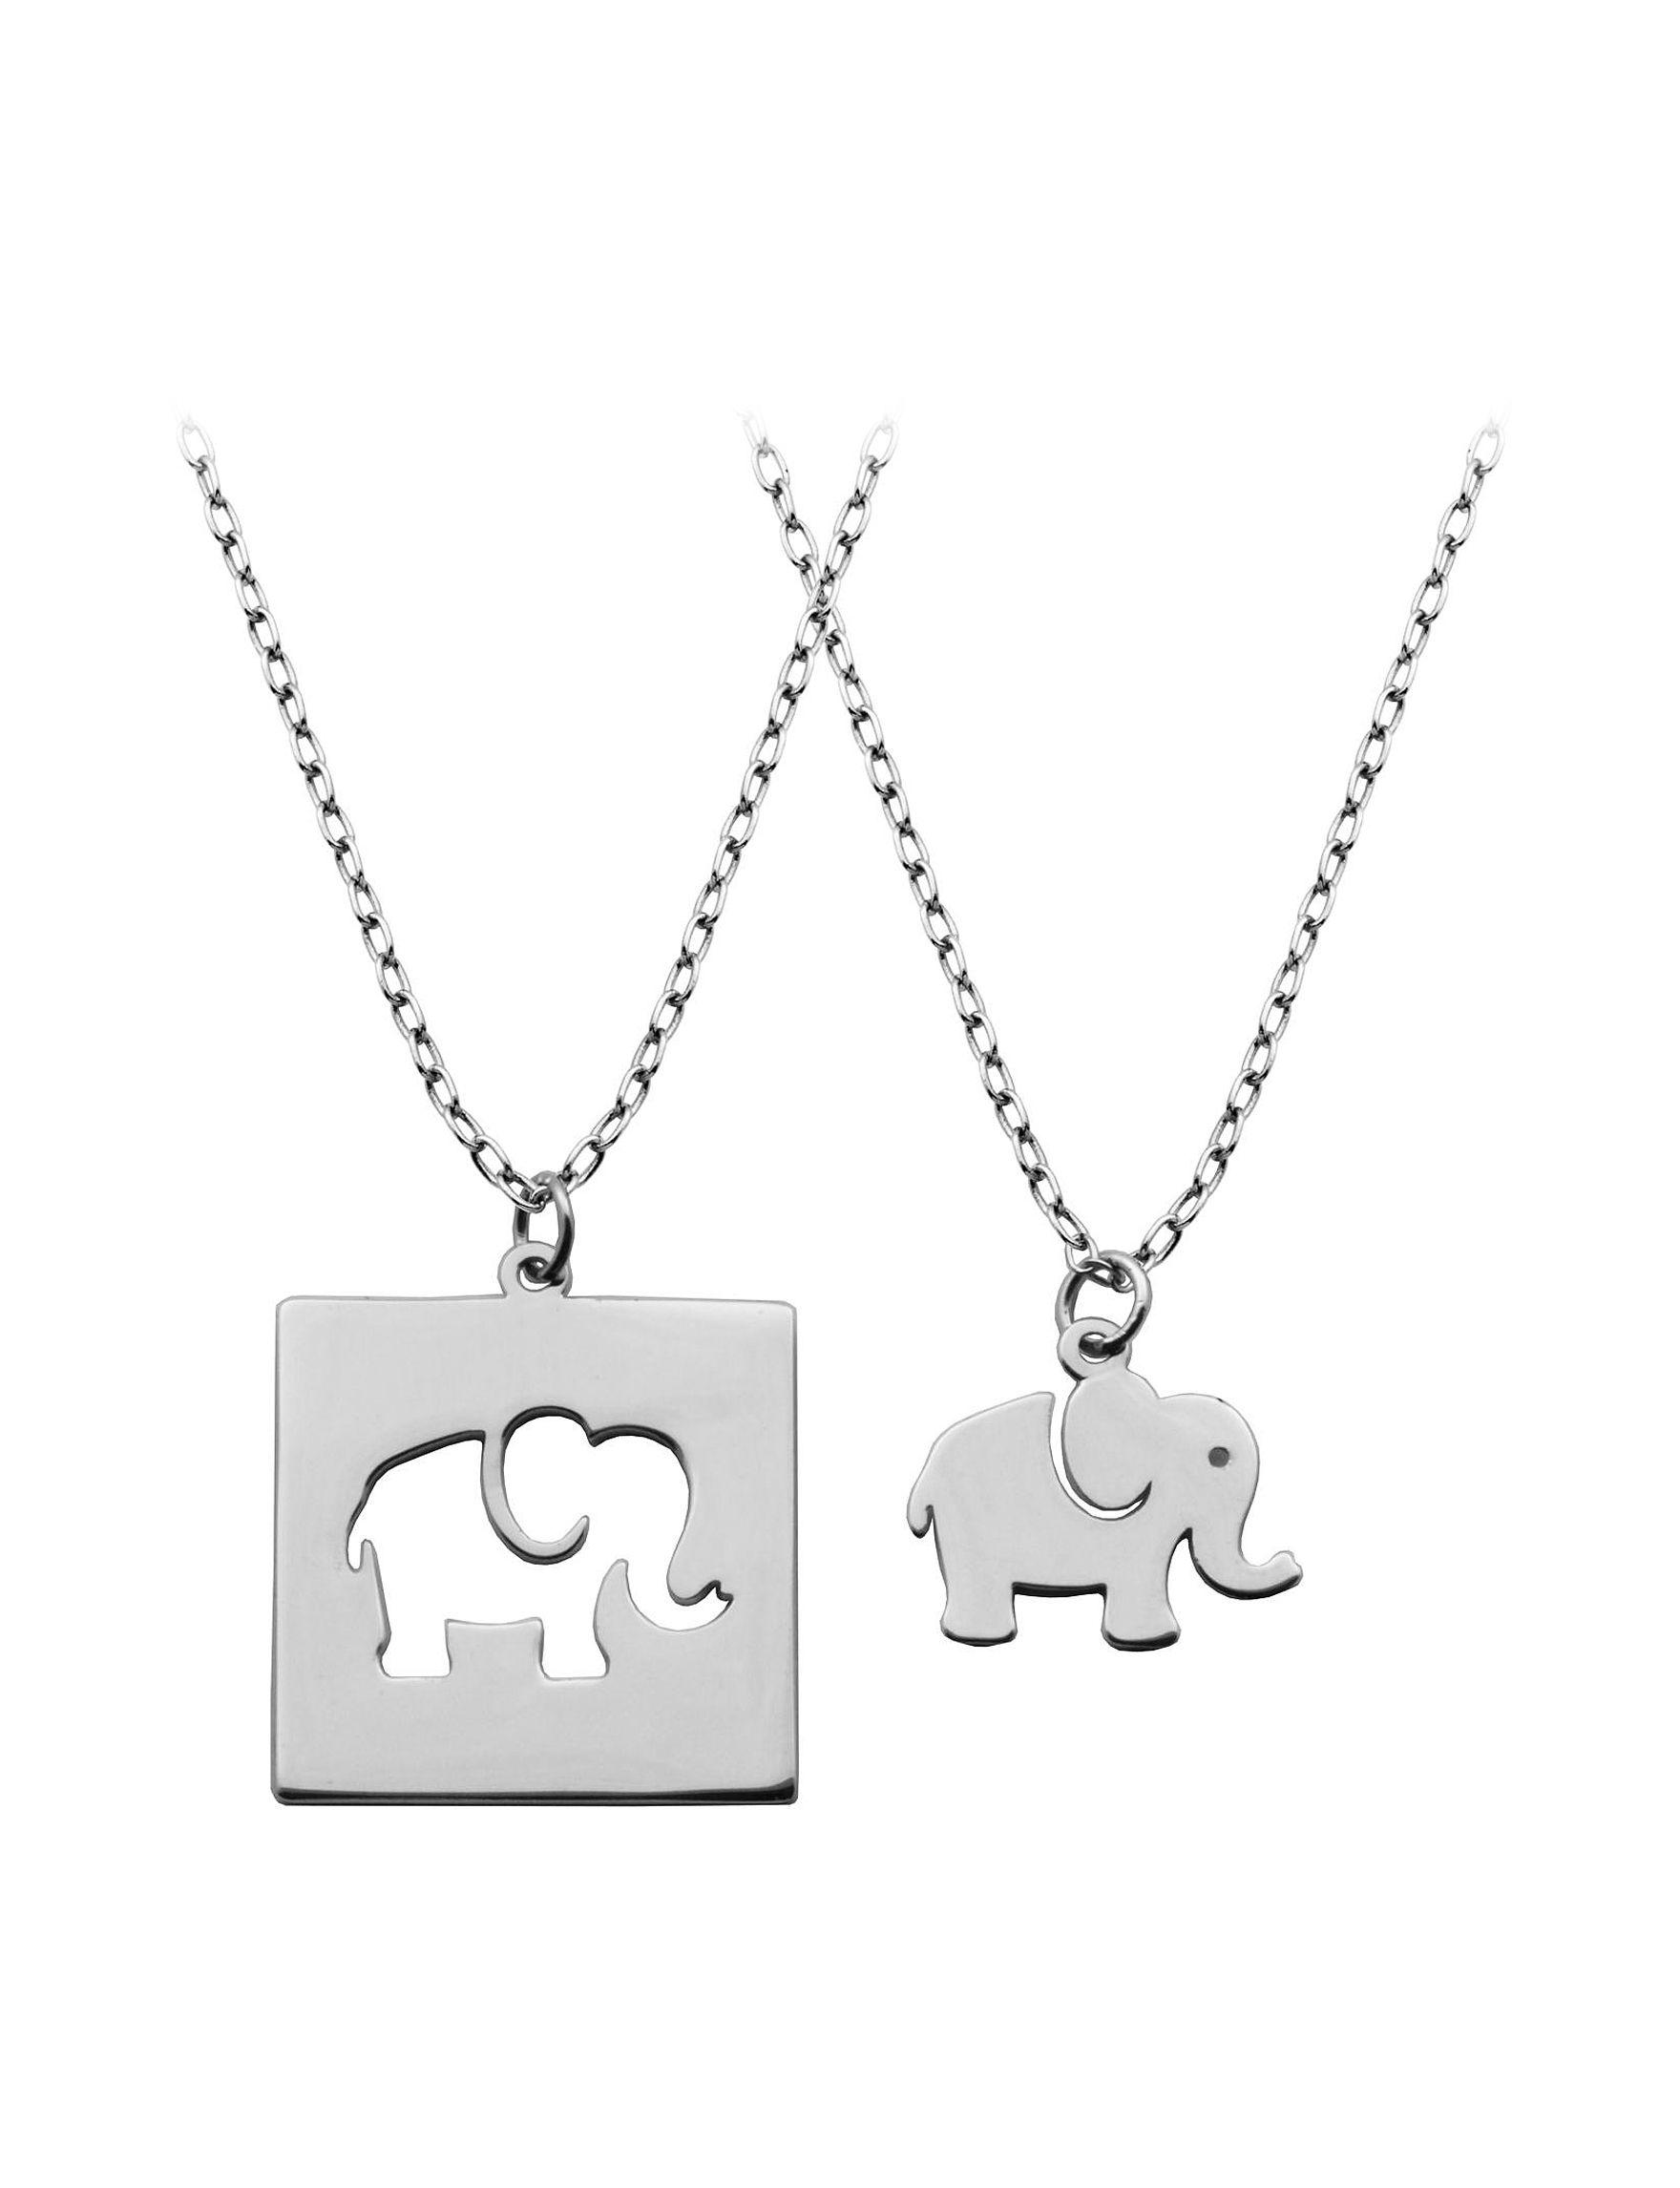 PAJ INC. White / Silver Necklaces & Pendants Fine Jewelry